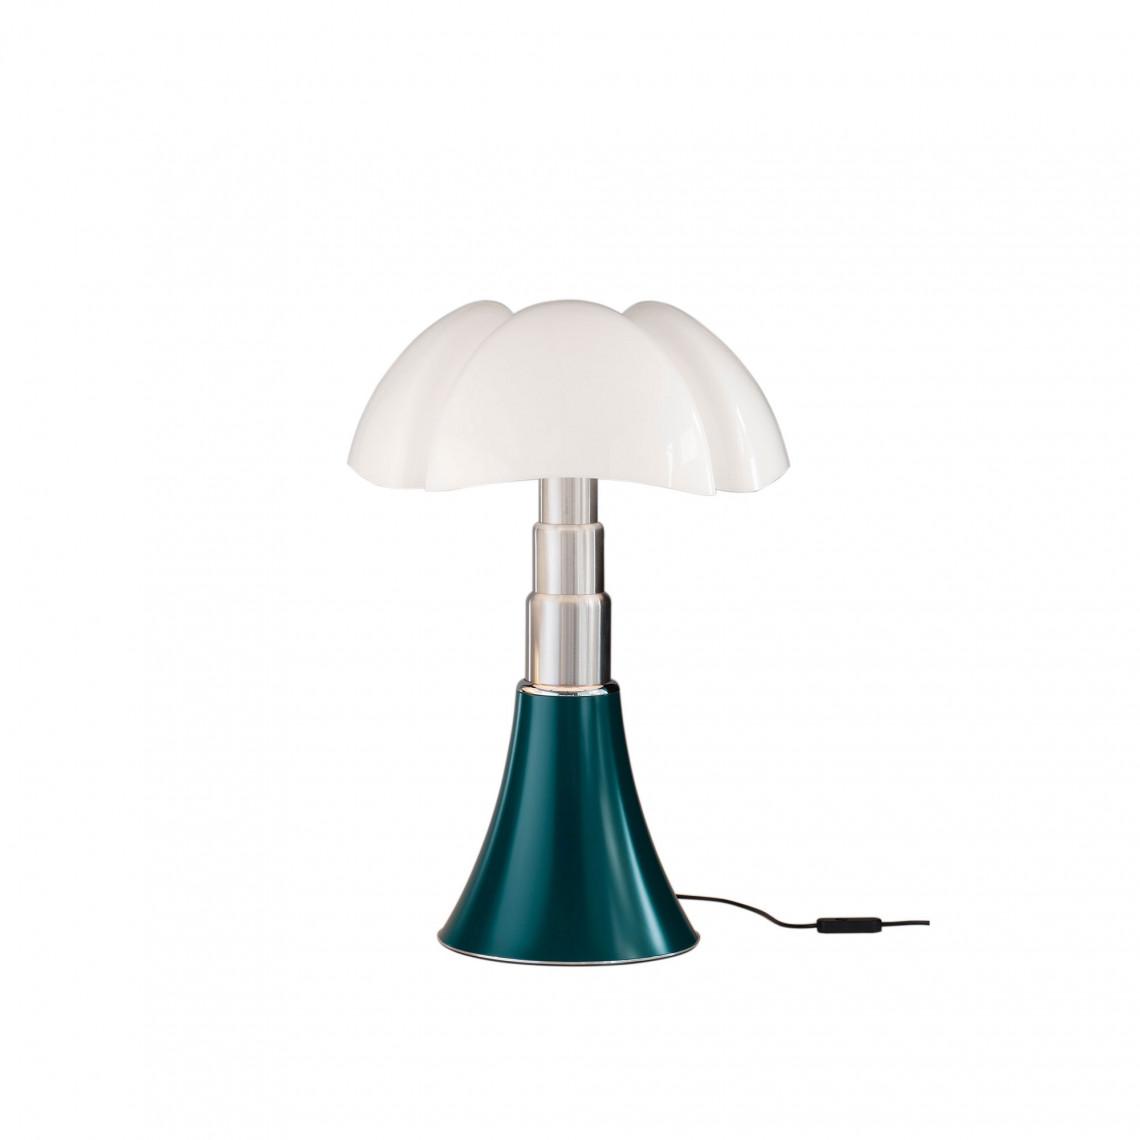 Pipistrello Medium Table Lamp, Agave Green - Dimbar